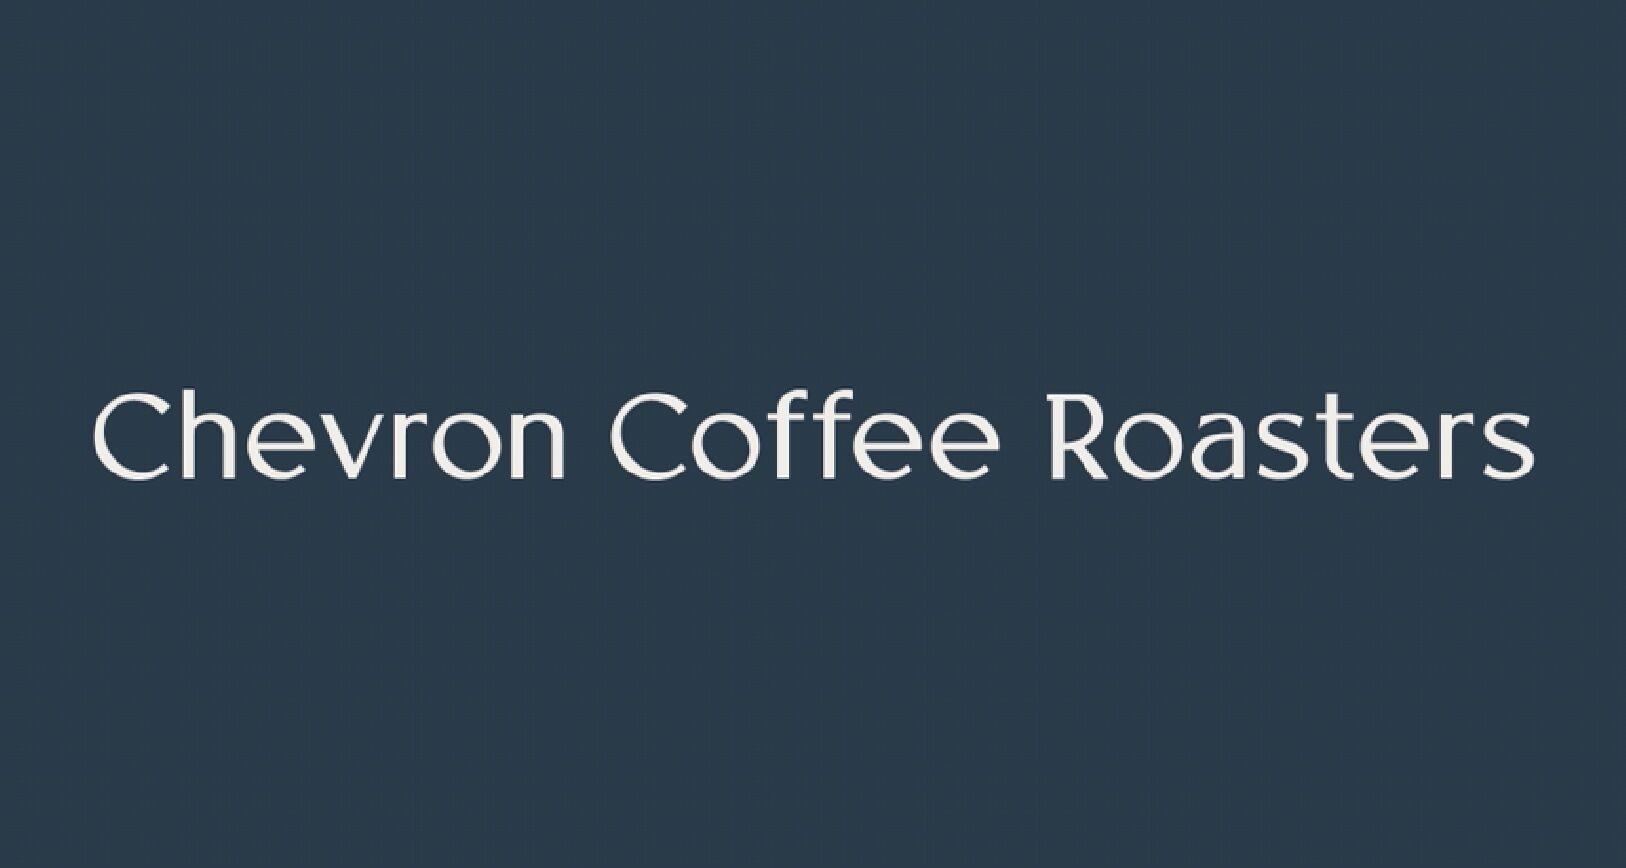 Chevron Coffee Roasters